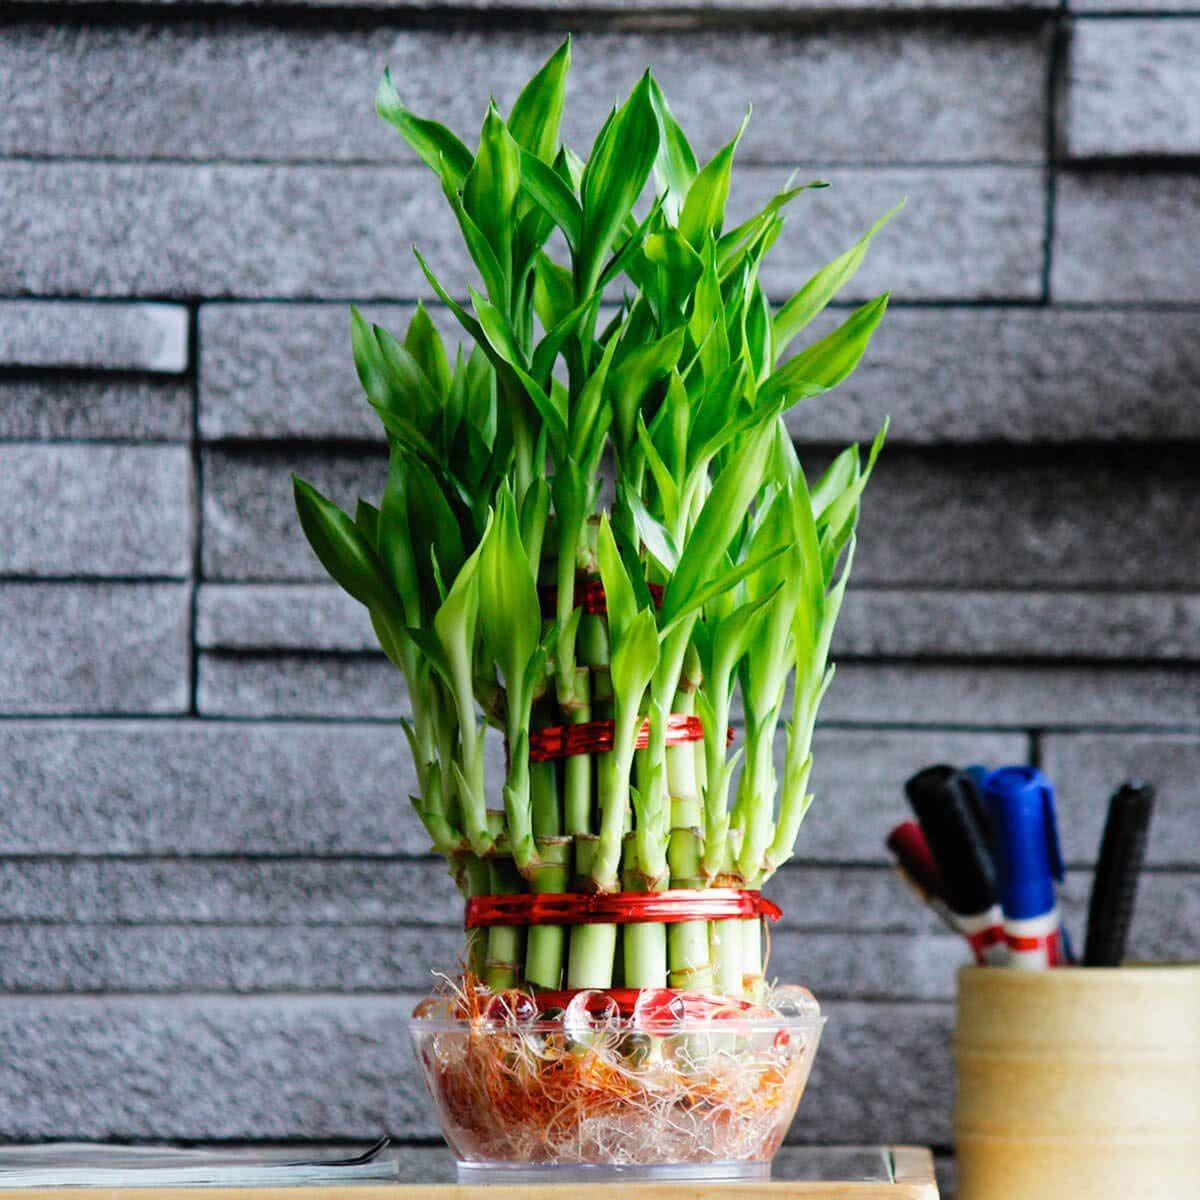 The Bonsai Plants Lucky 3 Layer Bonsai Bamboo Plant With Pot Bonsai Tree Bamboo Tree Buy The Bonsai Plants Lucky 3 Layer Bonsai Bamboo Plant With Pot Bonsai Tree Bamboo Tree Online